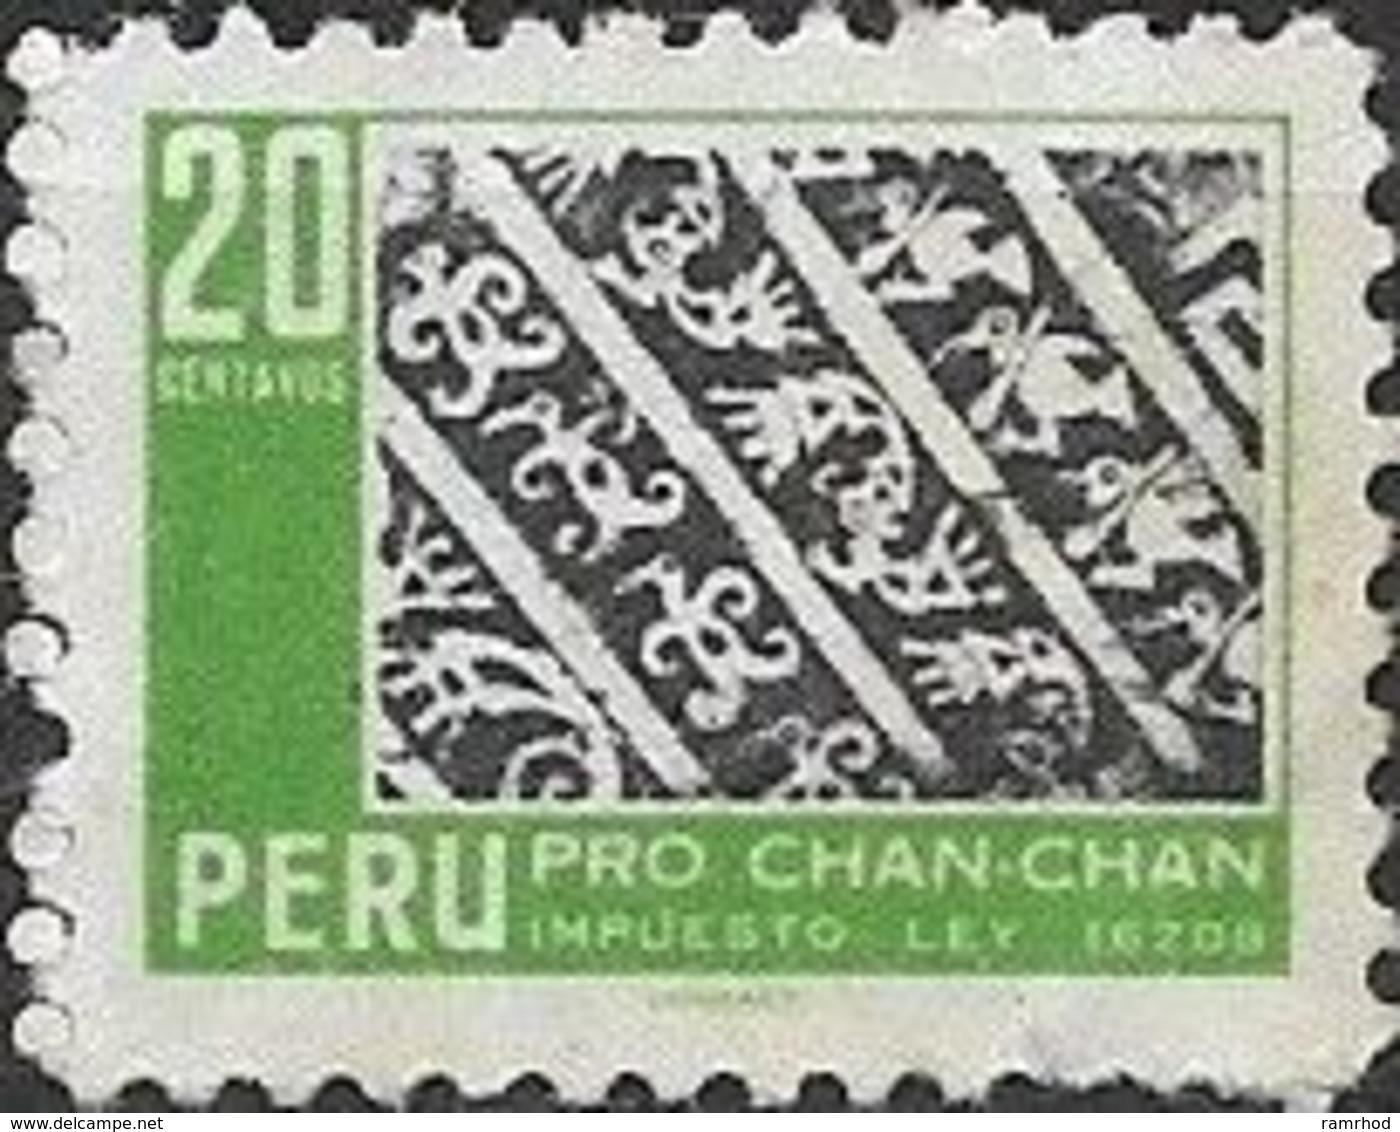 PERU 1967 Obligatory Tax. Chan-Chan Excavation Fund - 20c  Ornamental Pattern (birds) FU - Pérou